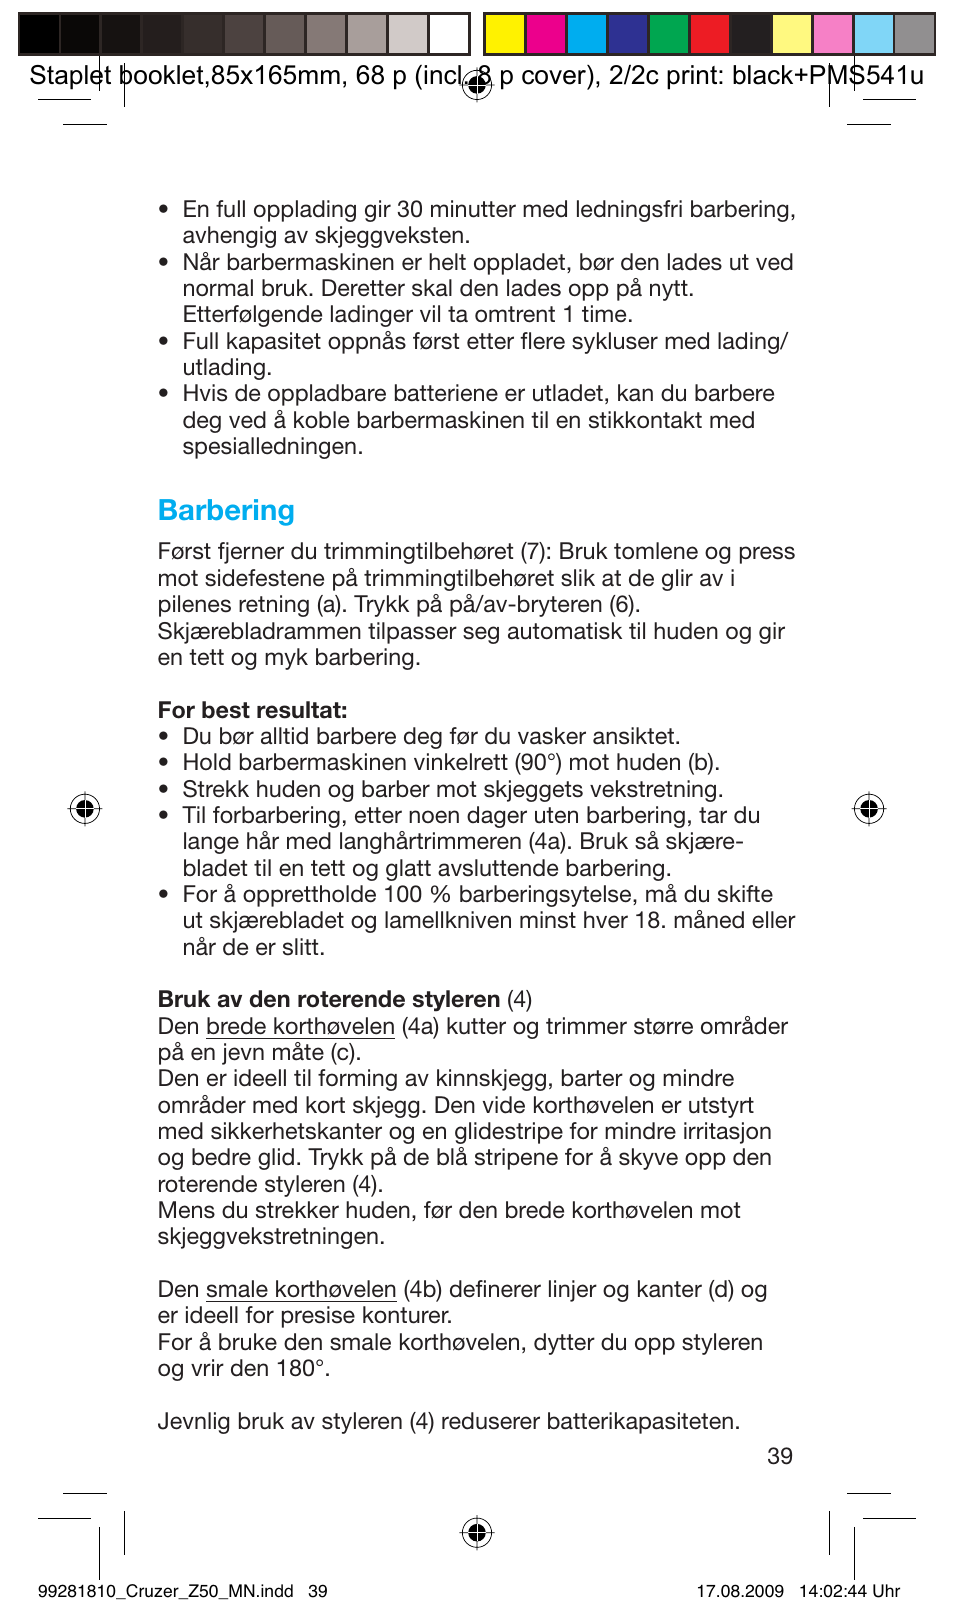 5c2584b8 Barbering   Braun Z50-5734 CruZer3 User Manual   Page 39 / 66 ...